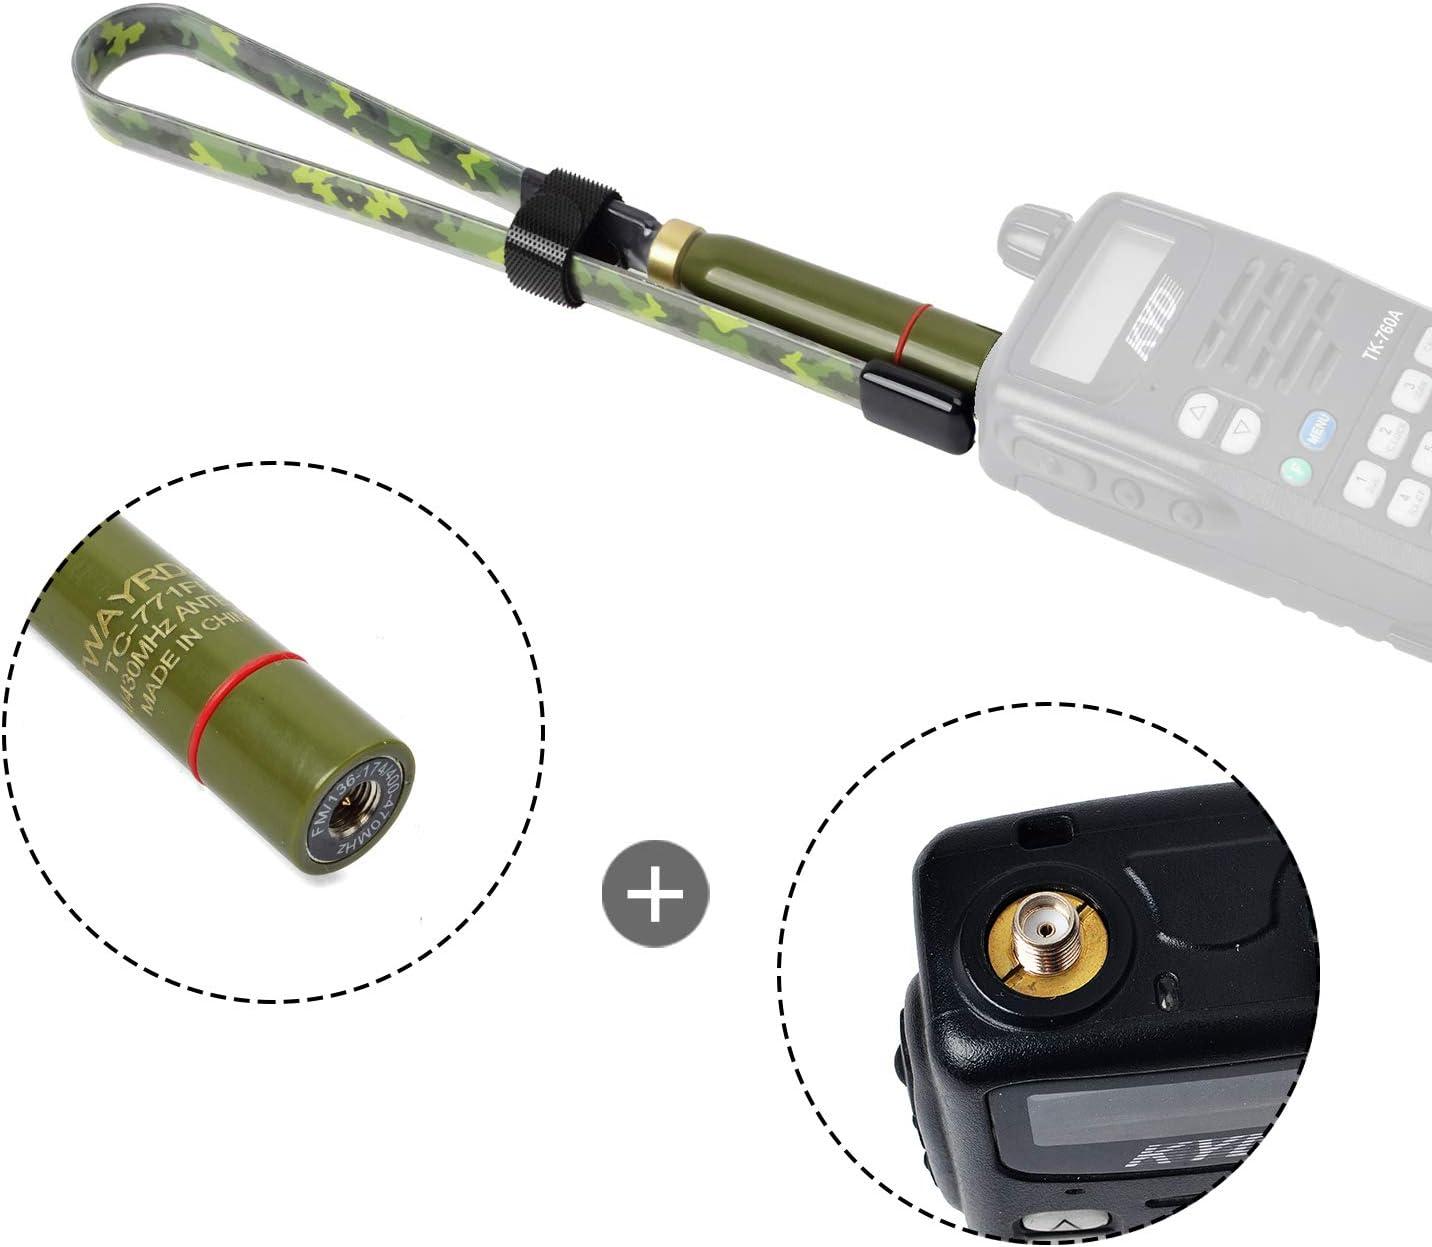 TWAYRDIO Portable Tactical Antenna 771Q for YAESU VX-6R FT-60R Retevis RT82 RT3 TYT MD-380 MD-UV380 Two Way Radio SMA Male Camouflage Dual Band 2Meter 70cm 20inch Handheld Ham Radio Antenna